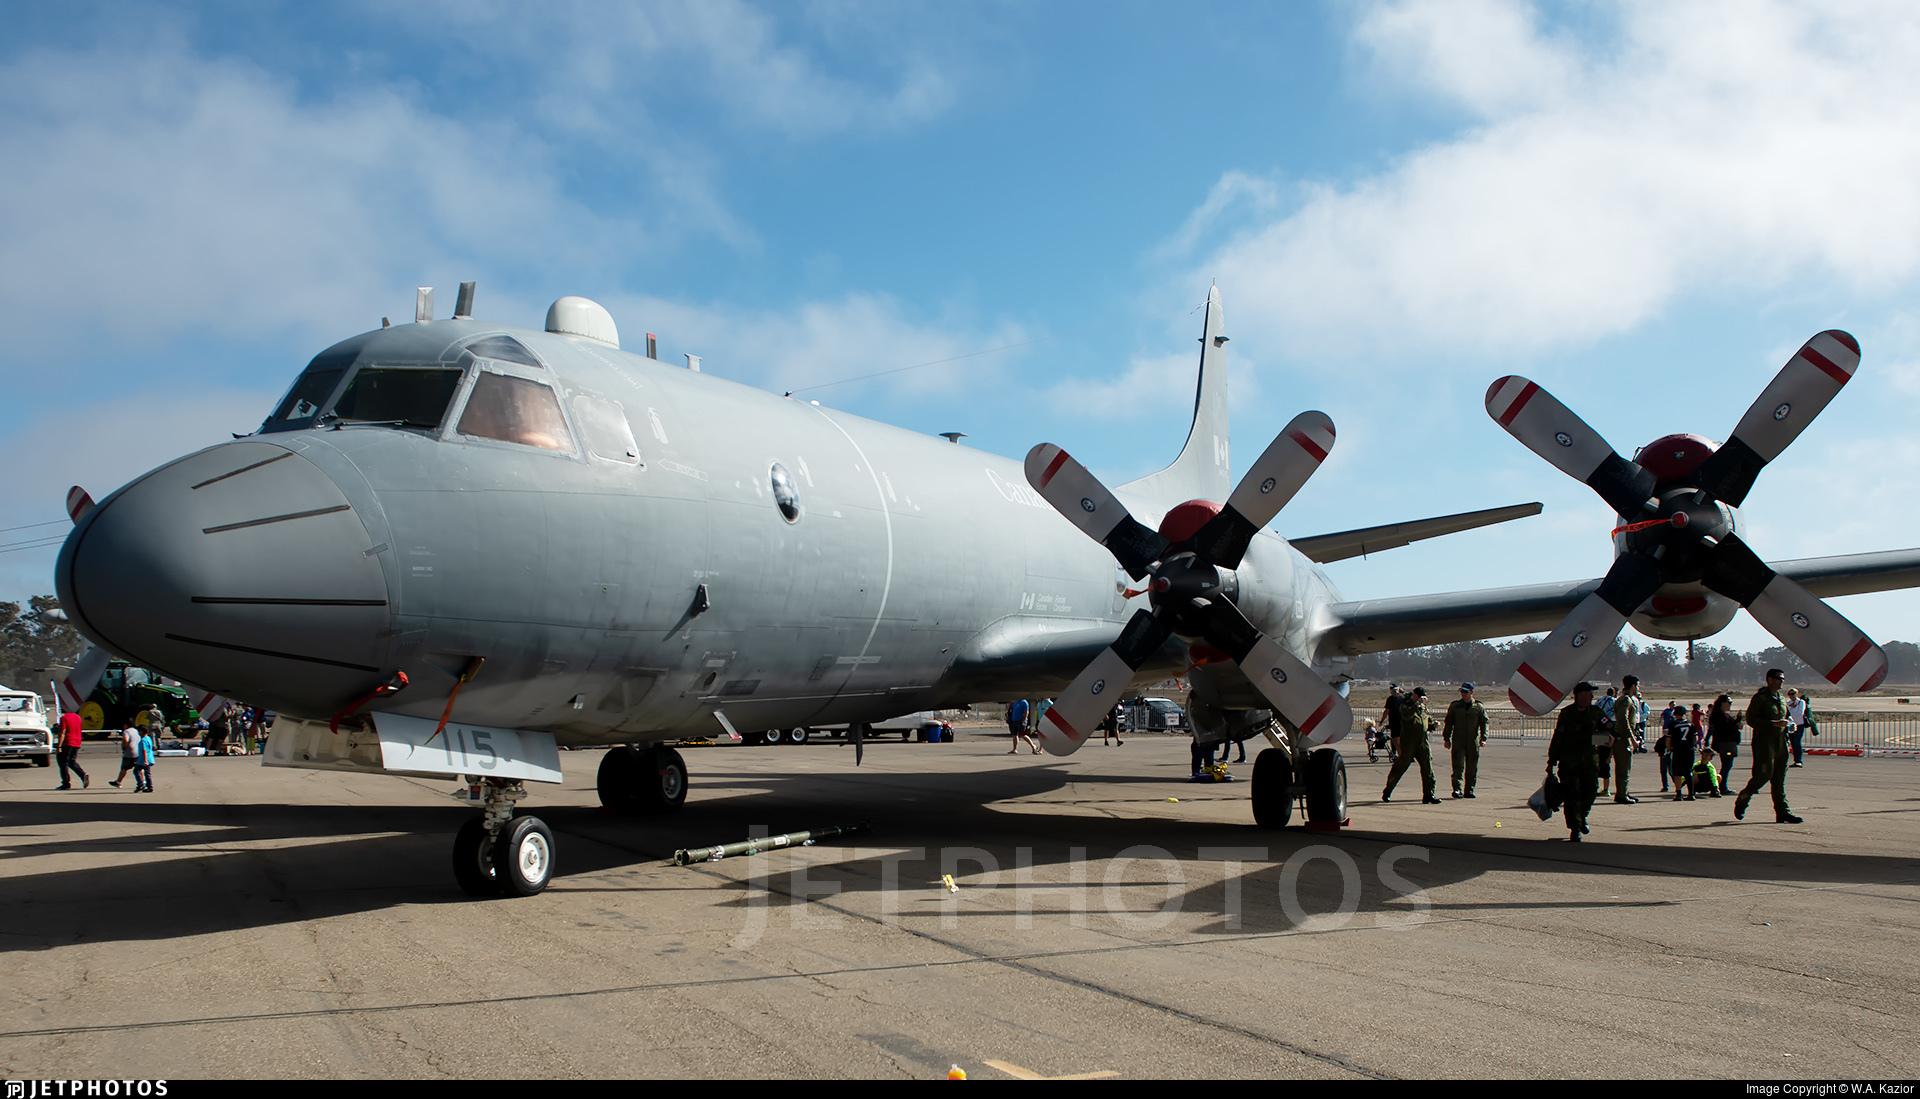 140114 - Lockheed CP-140 Aurora - Canada - Royal Canadian Air Force (RCAF)